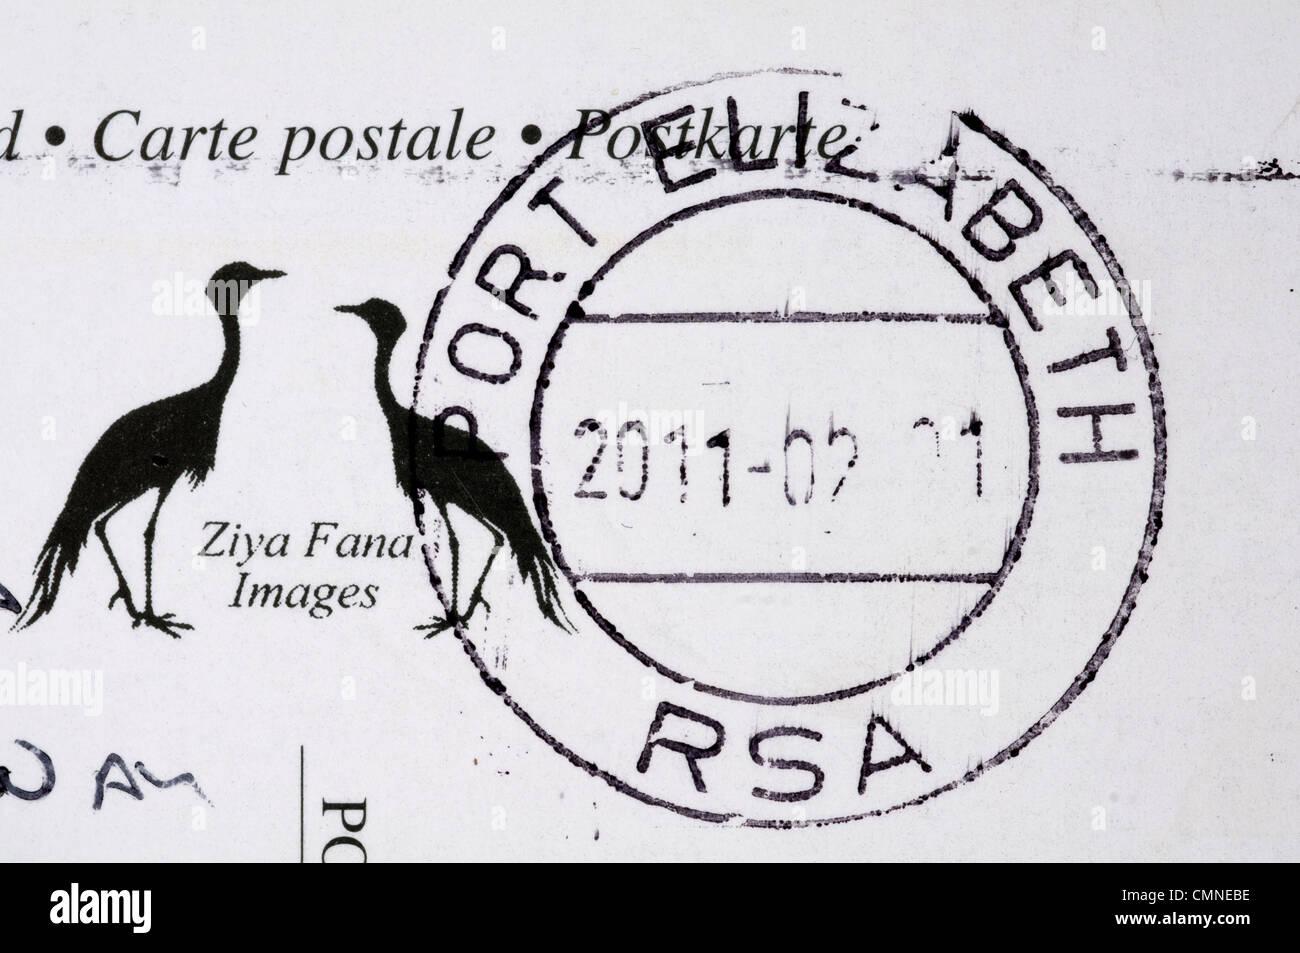 Port Elizabeth postmark - Stock Image